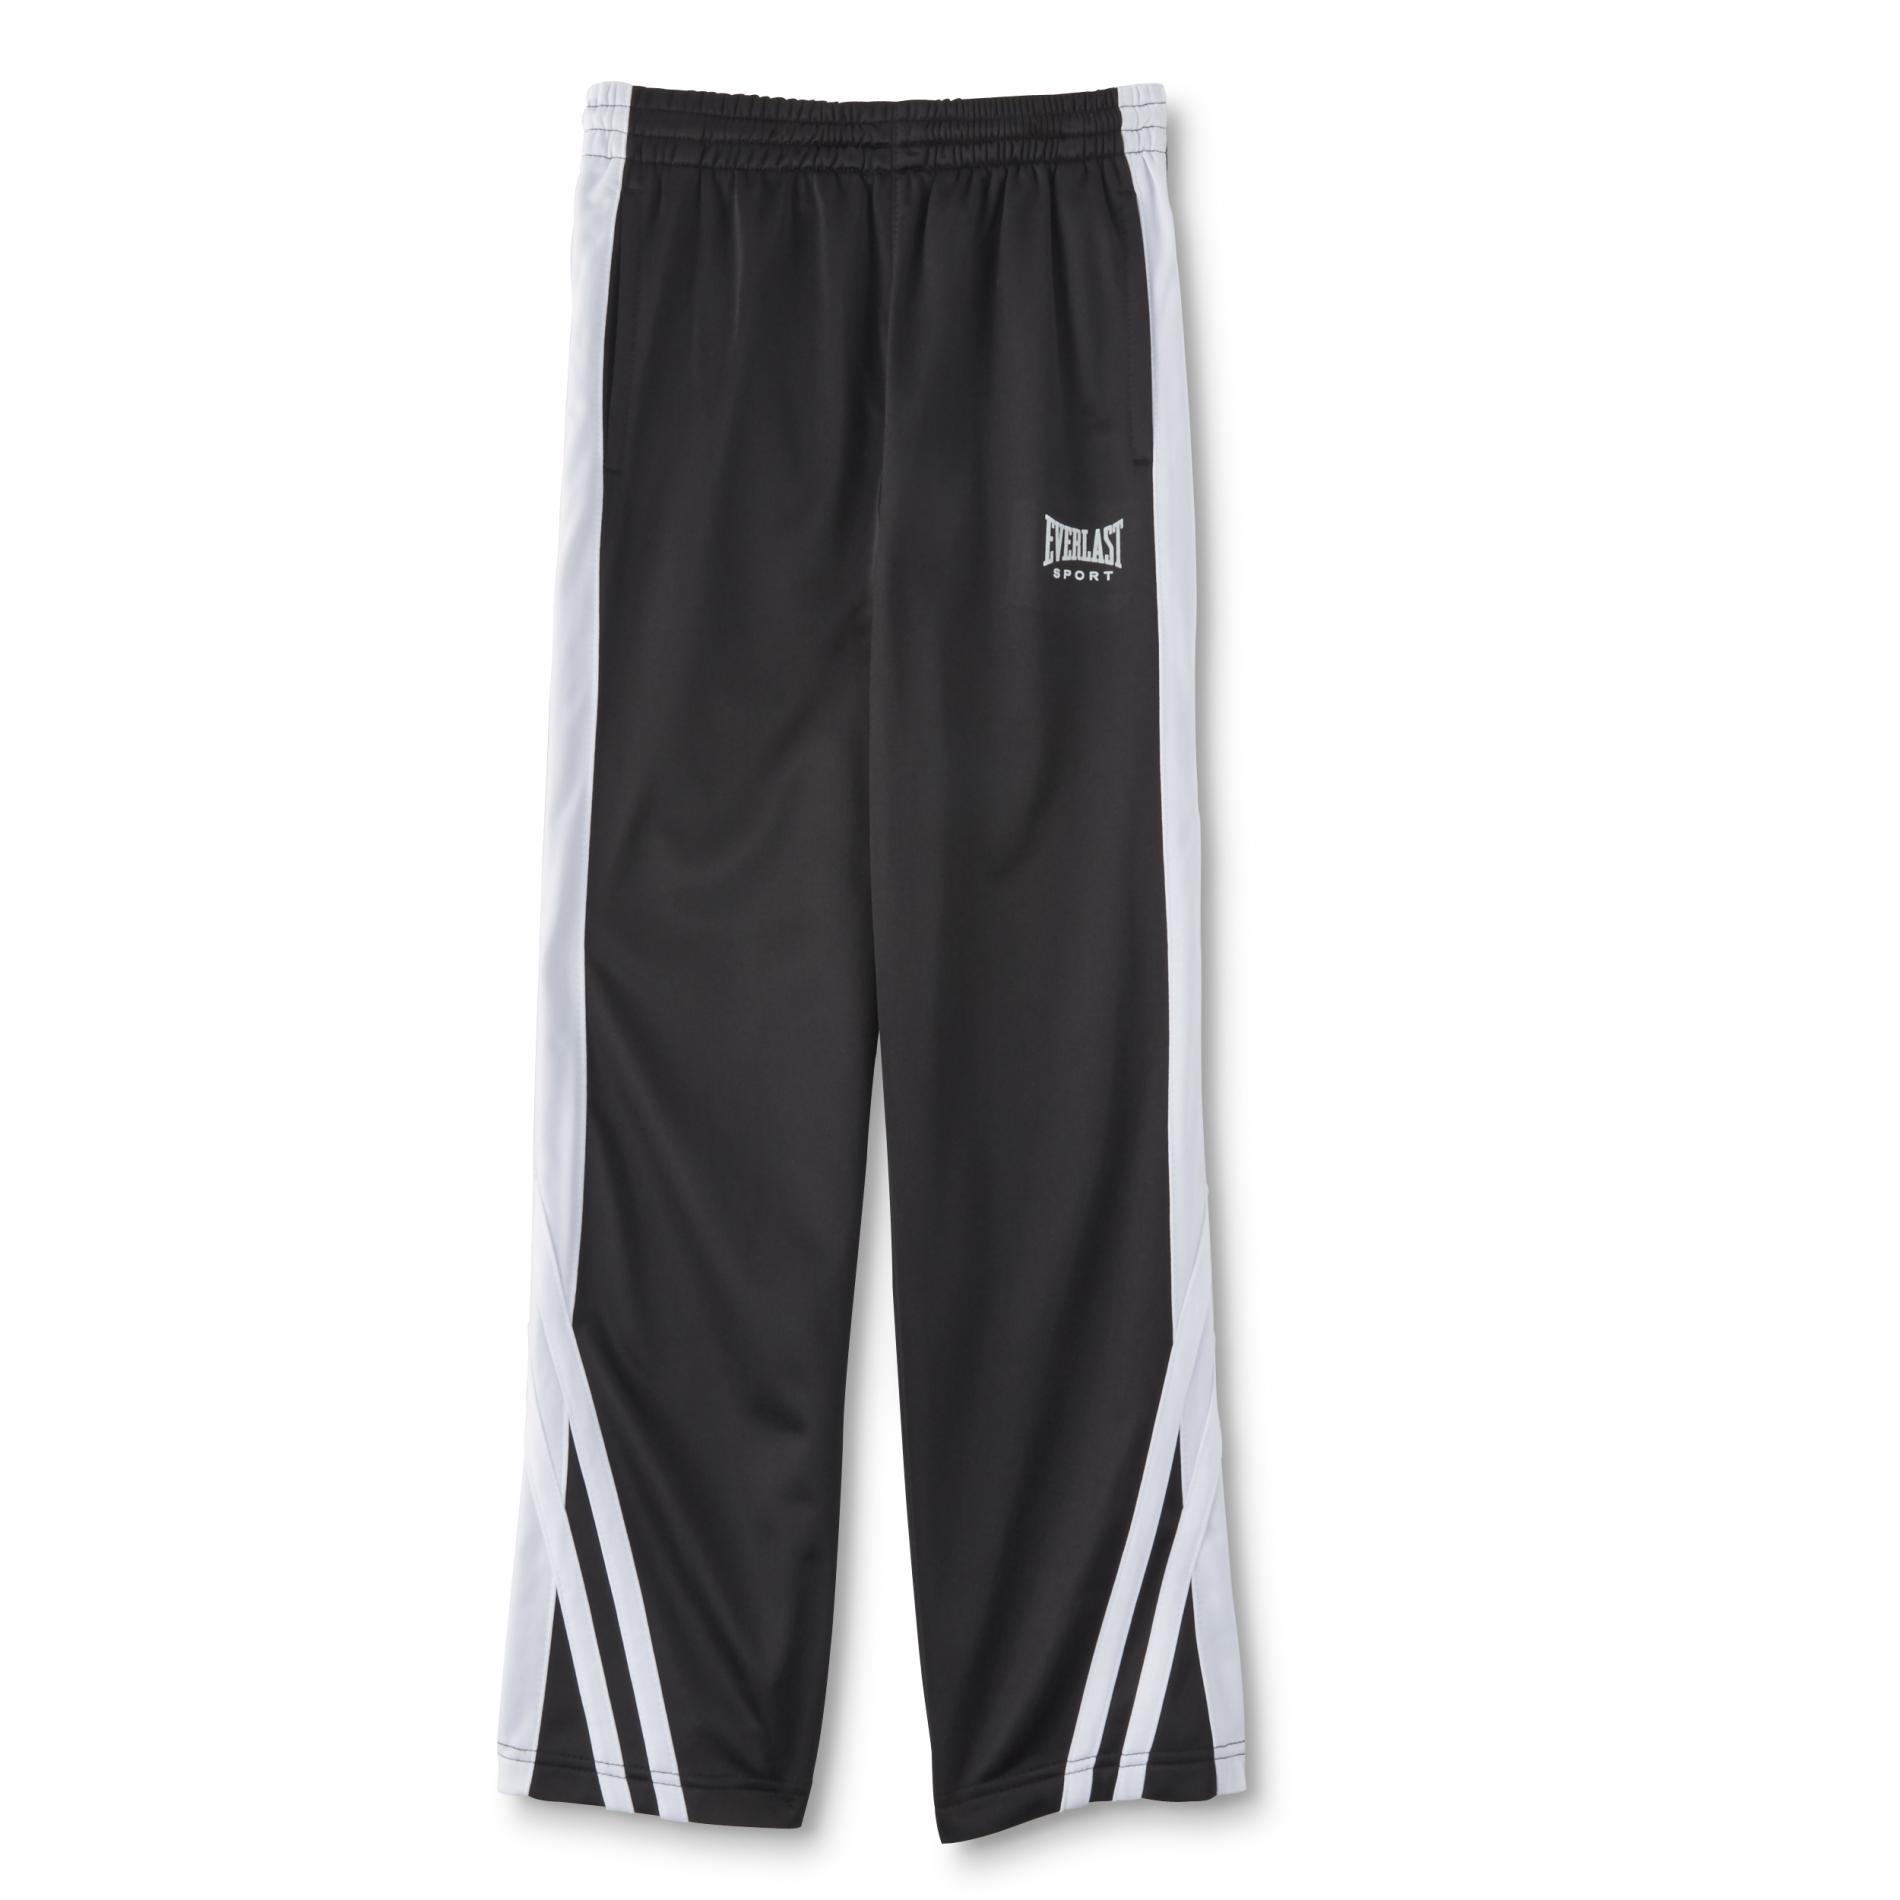 Everlast® Sport Boys' Athletic Pants PartNumber: A012098995 MfgPartNumber: BS8EK78201BB